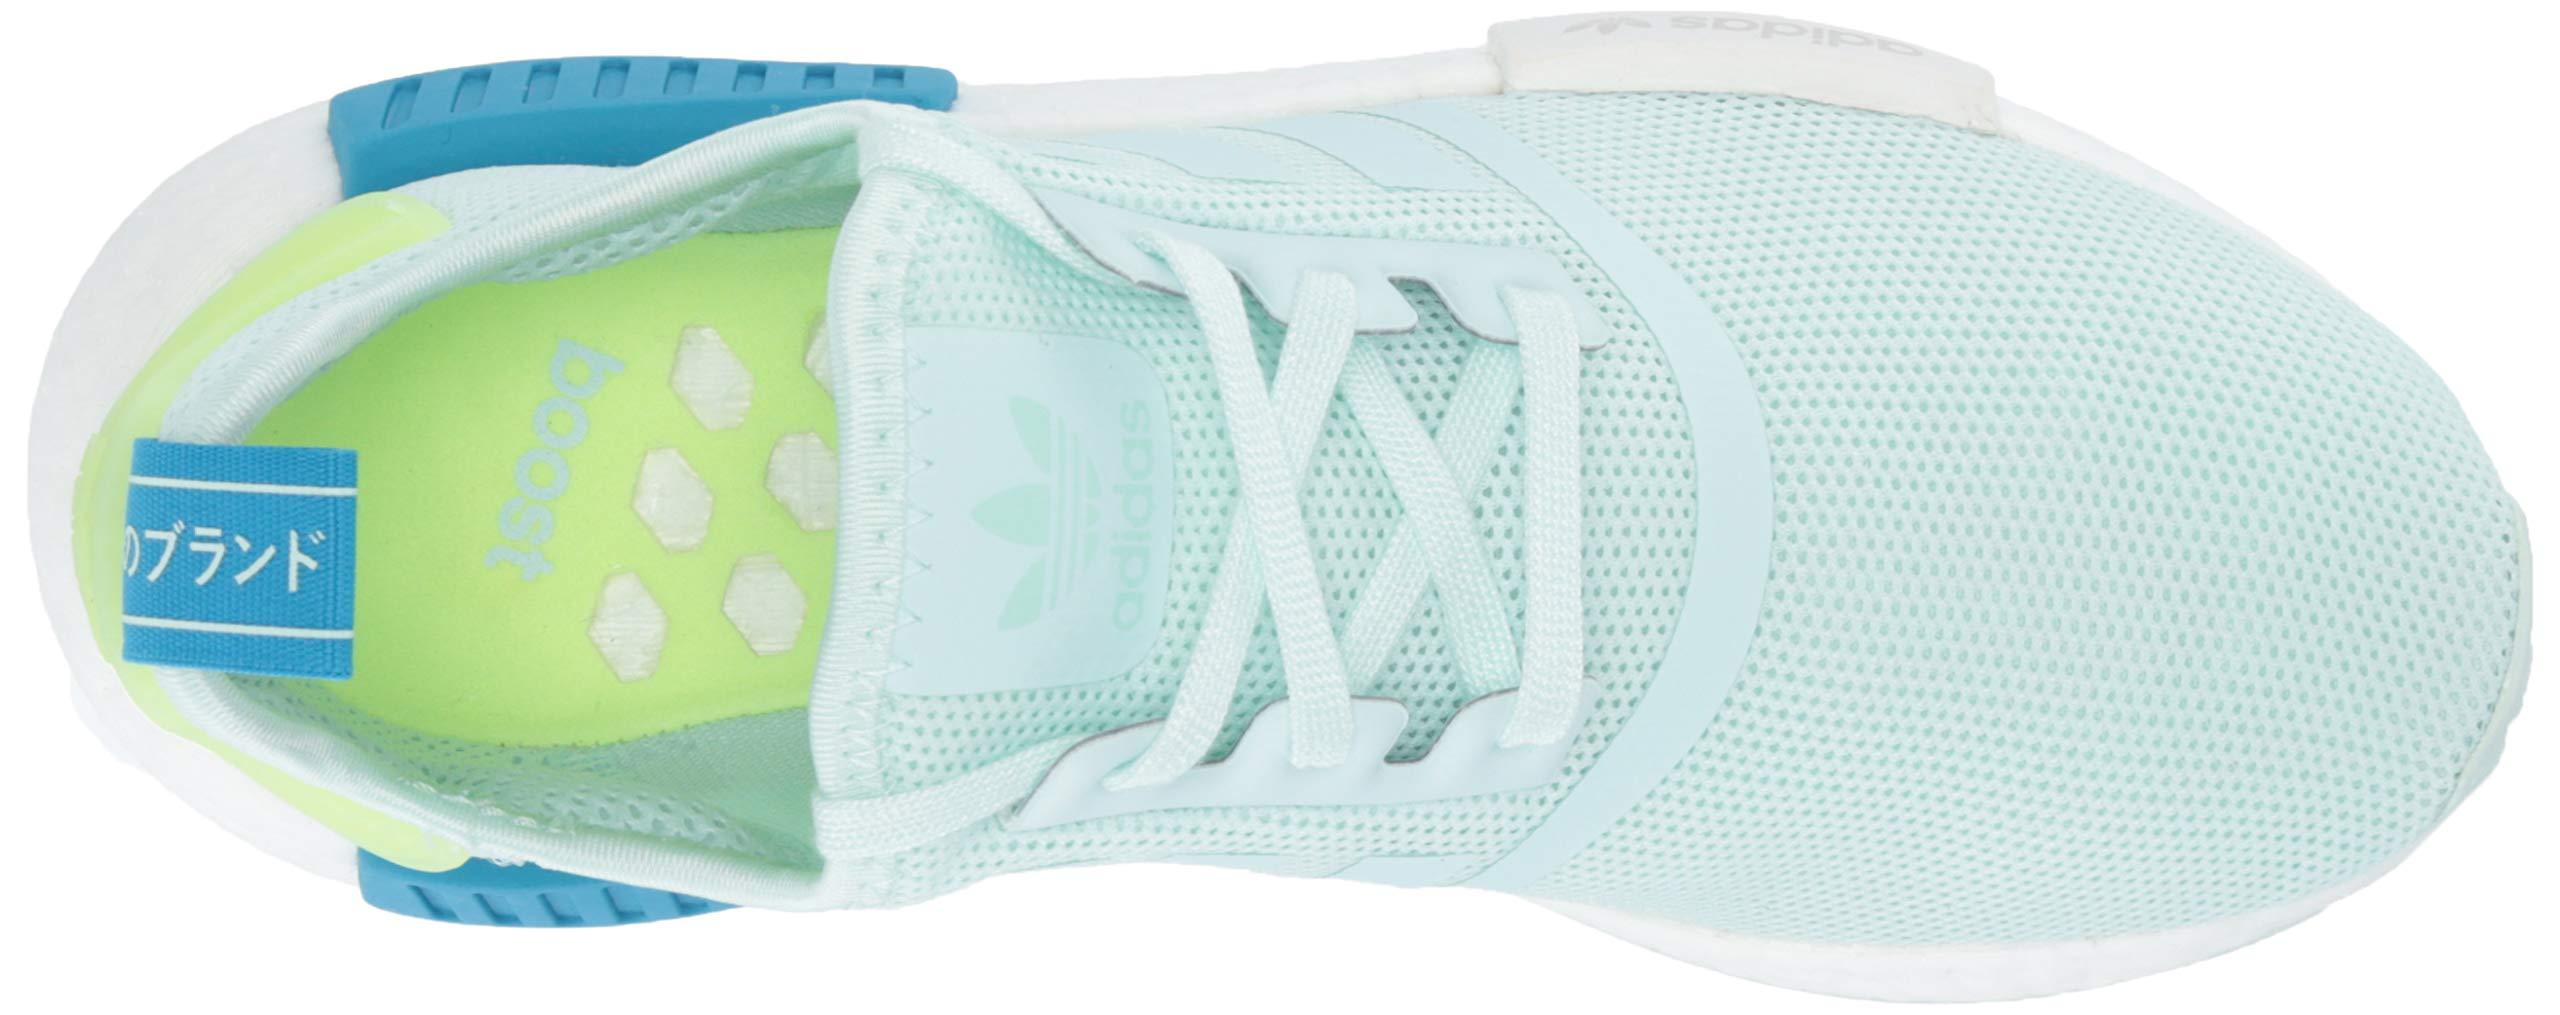 adidas Originals Unisex NMD_R1 Running Shoe, ice Mint/Shock Cyan, 3.5 M US Big Kid by adidas Originals (Image #7)